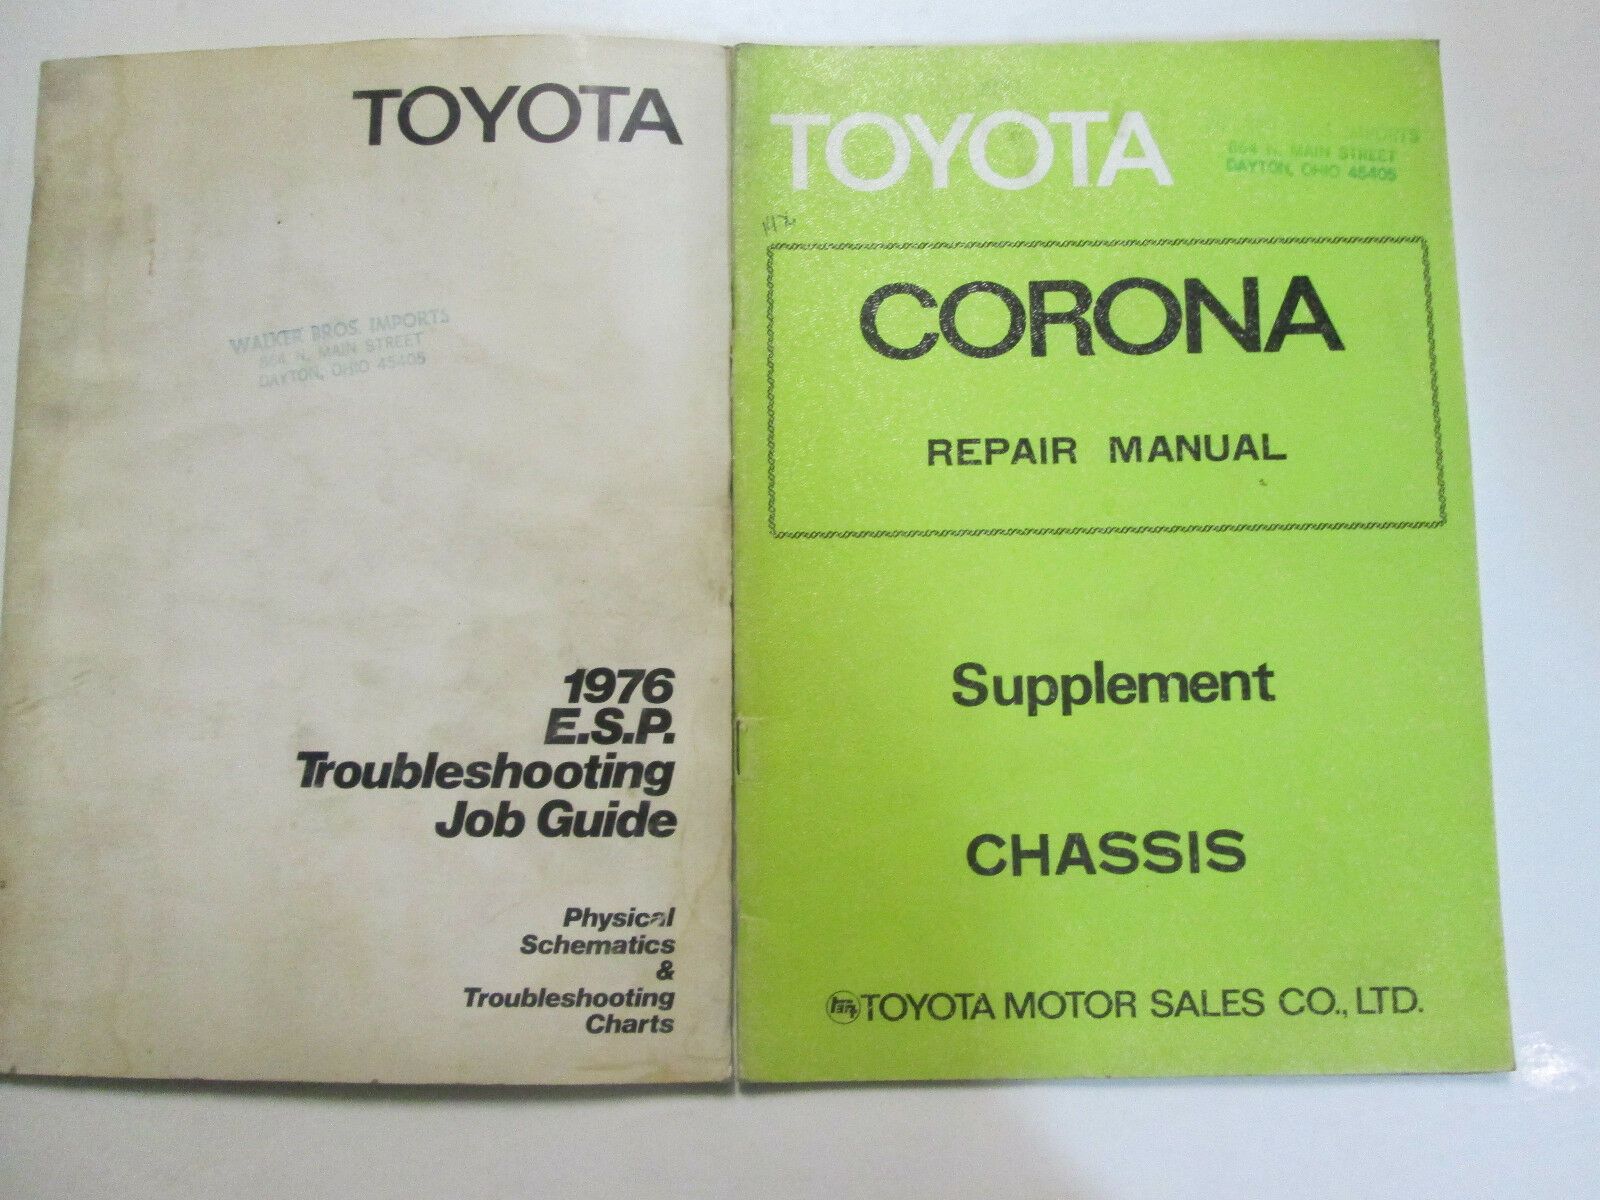 1976 toyota esr troubleshooting job guide set factory oem used books - $17.59